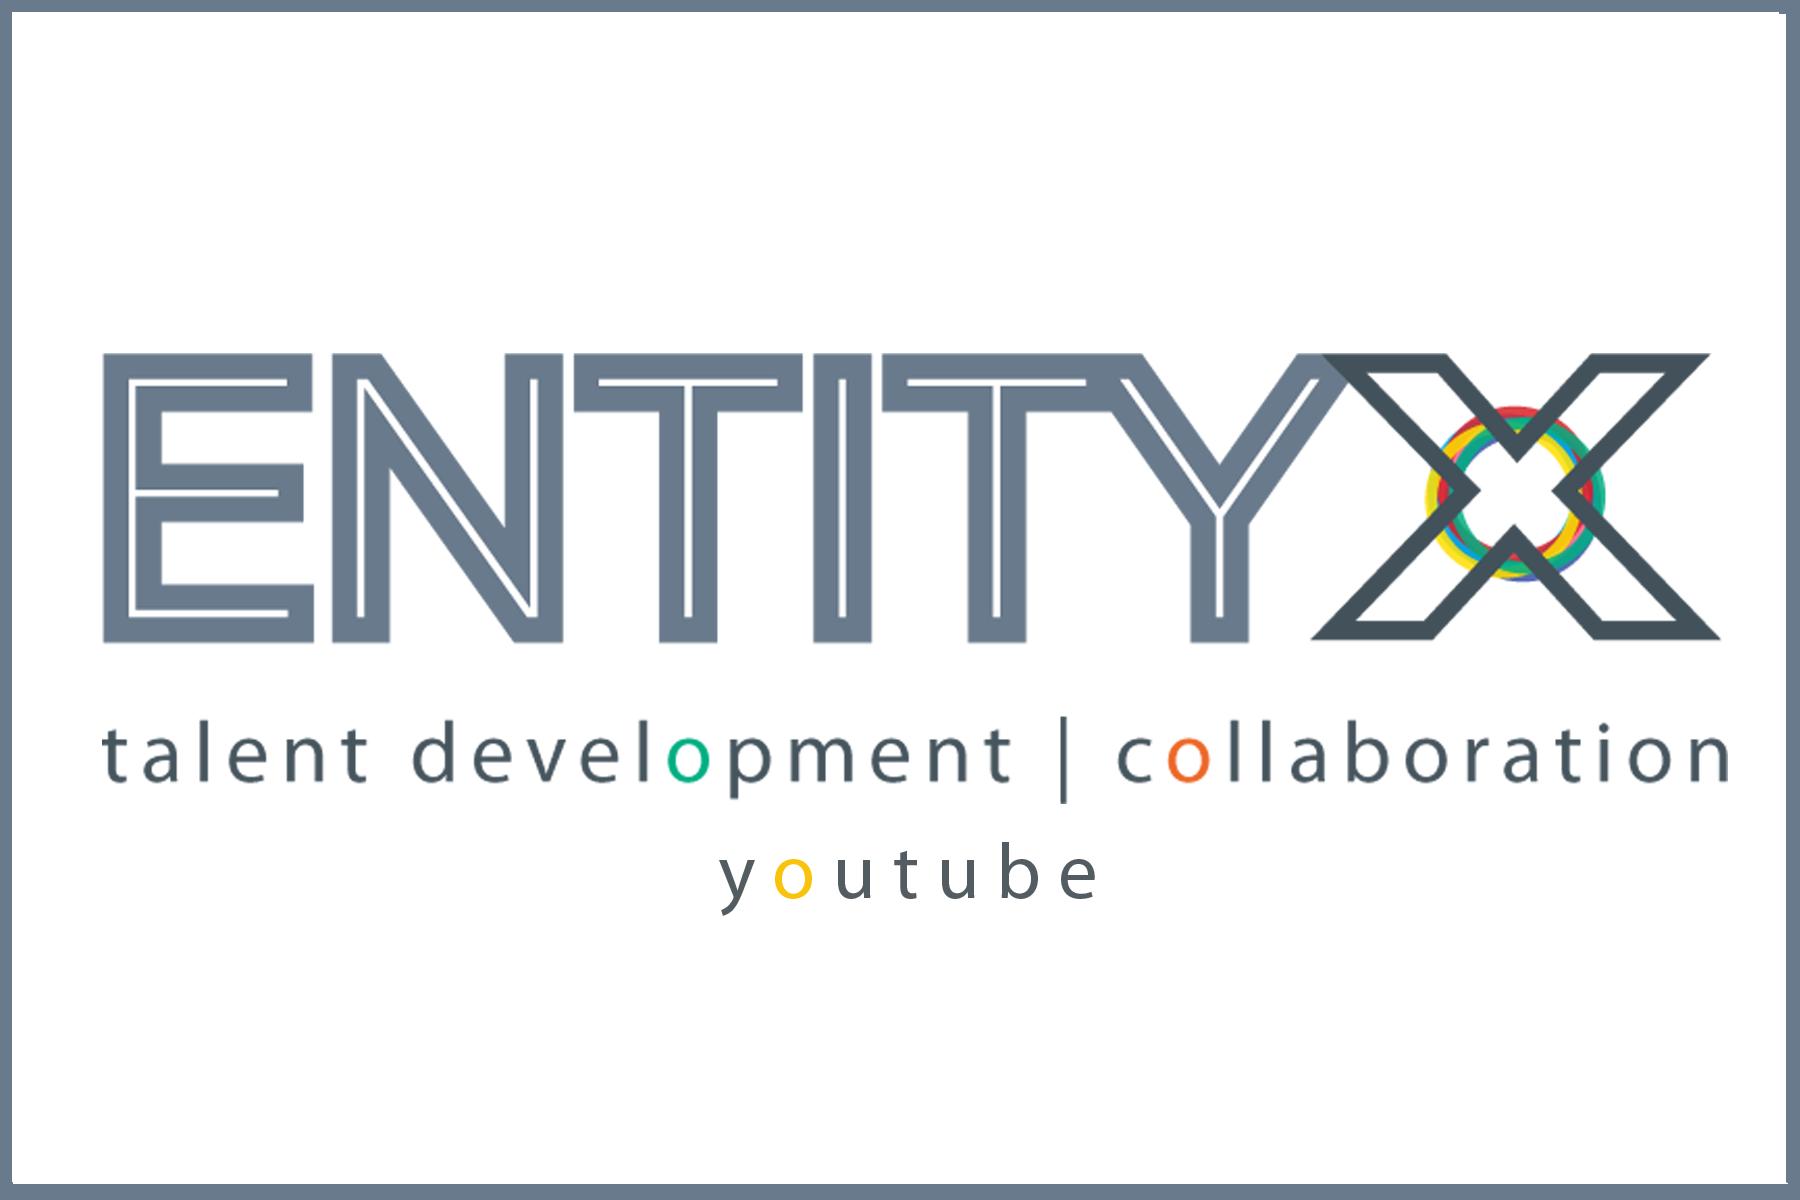 EntityX